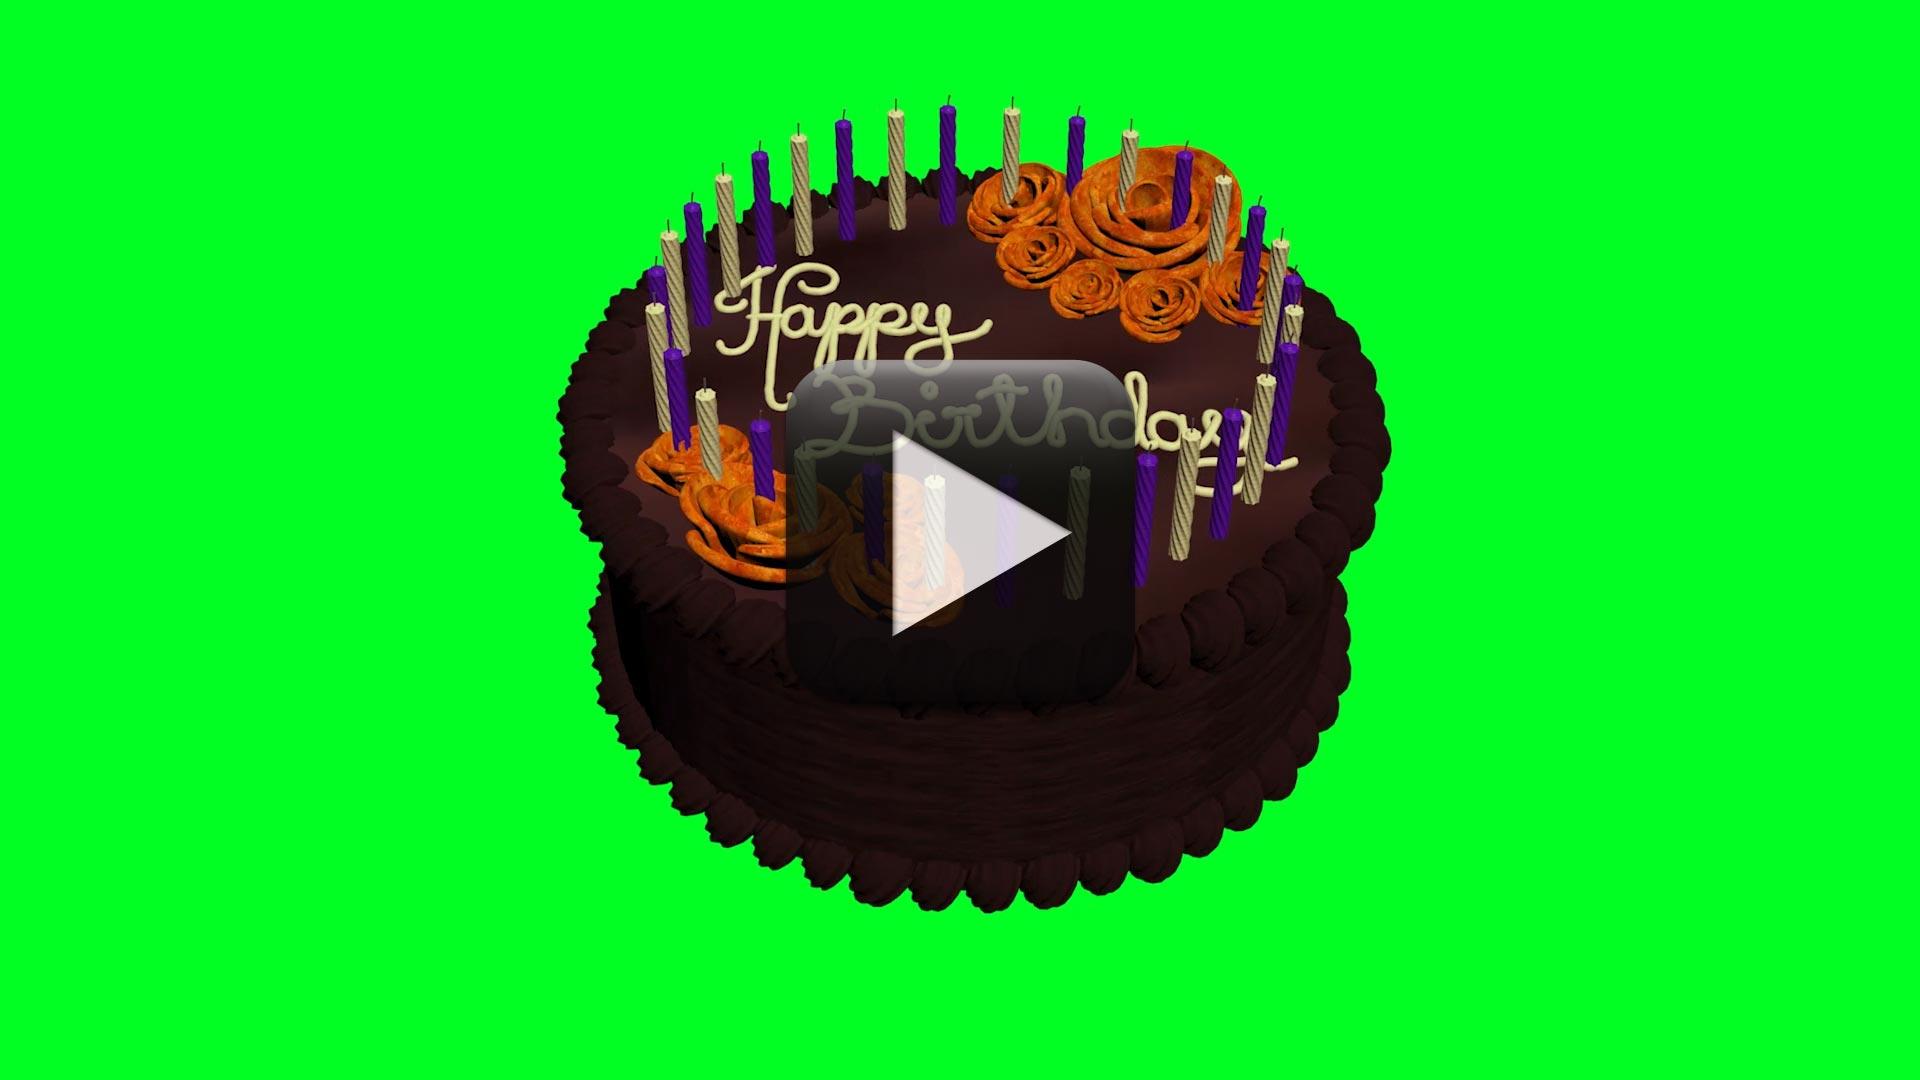 Animated Birthday Cake Green Screen